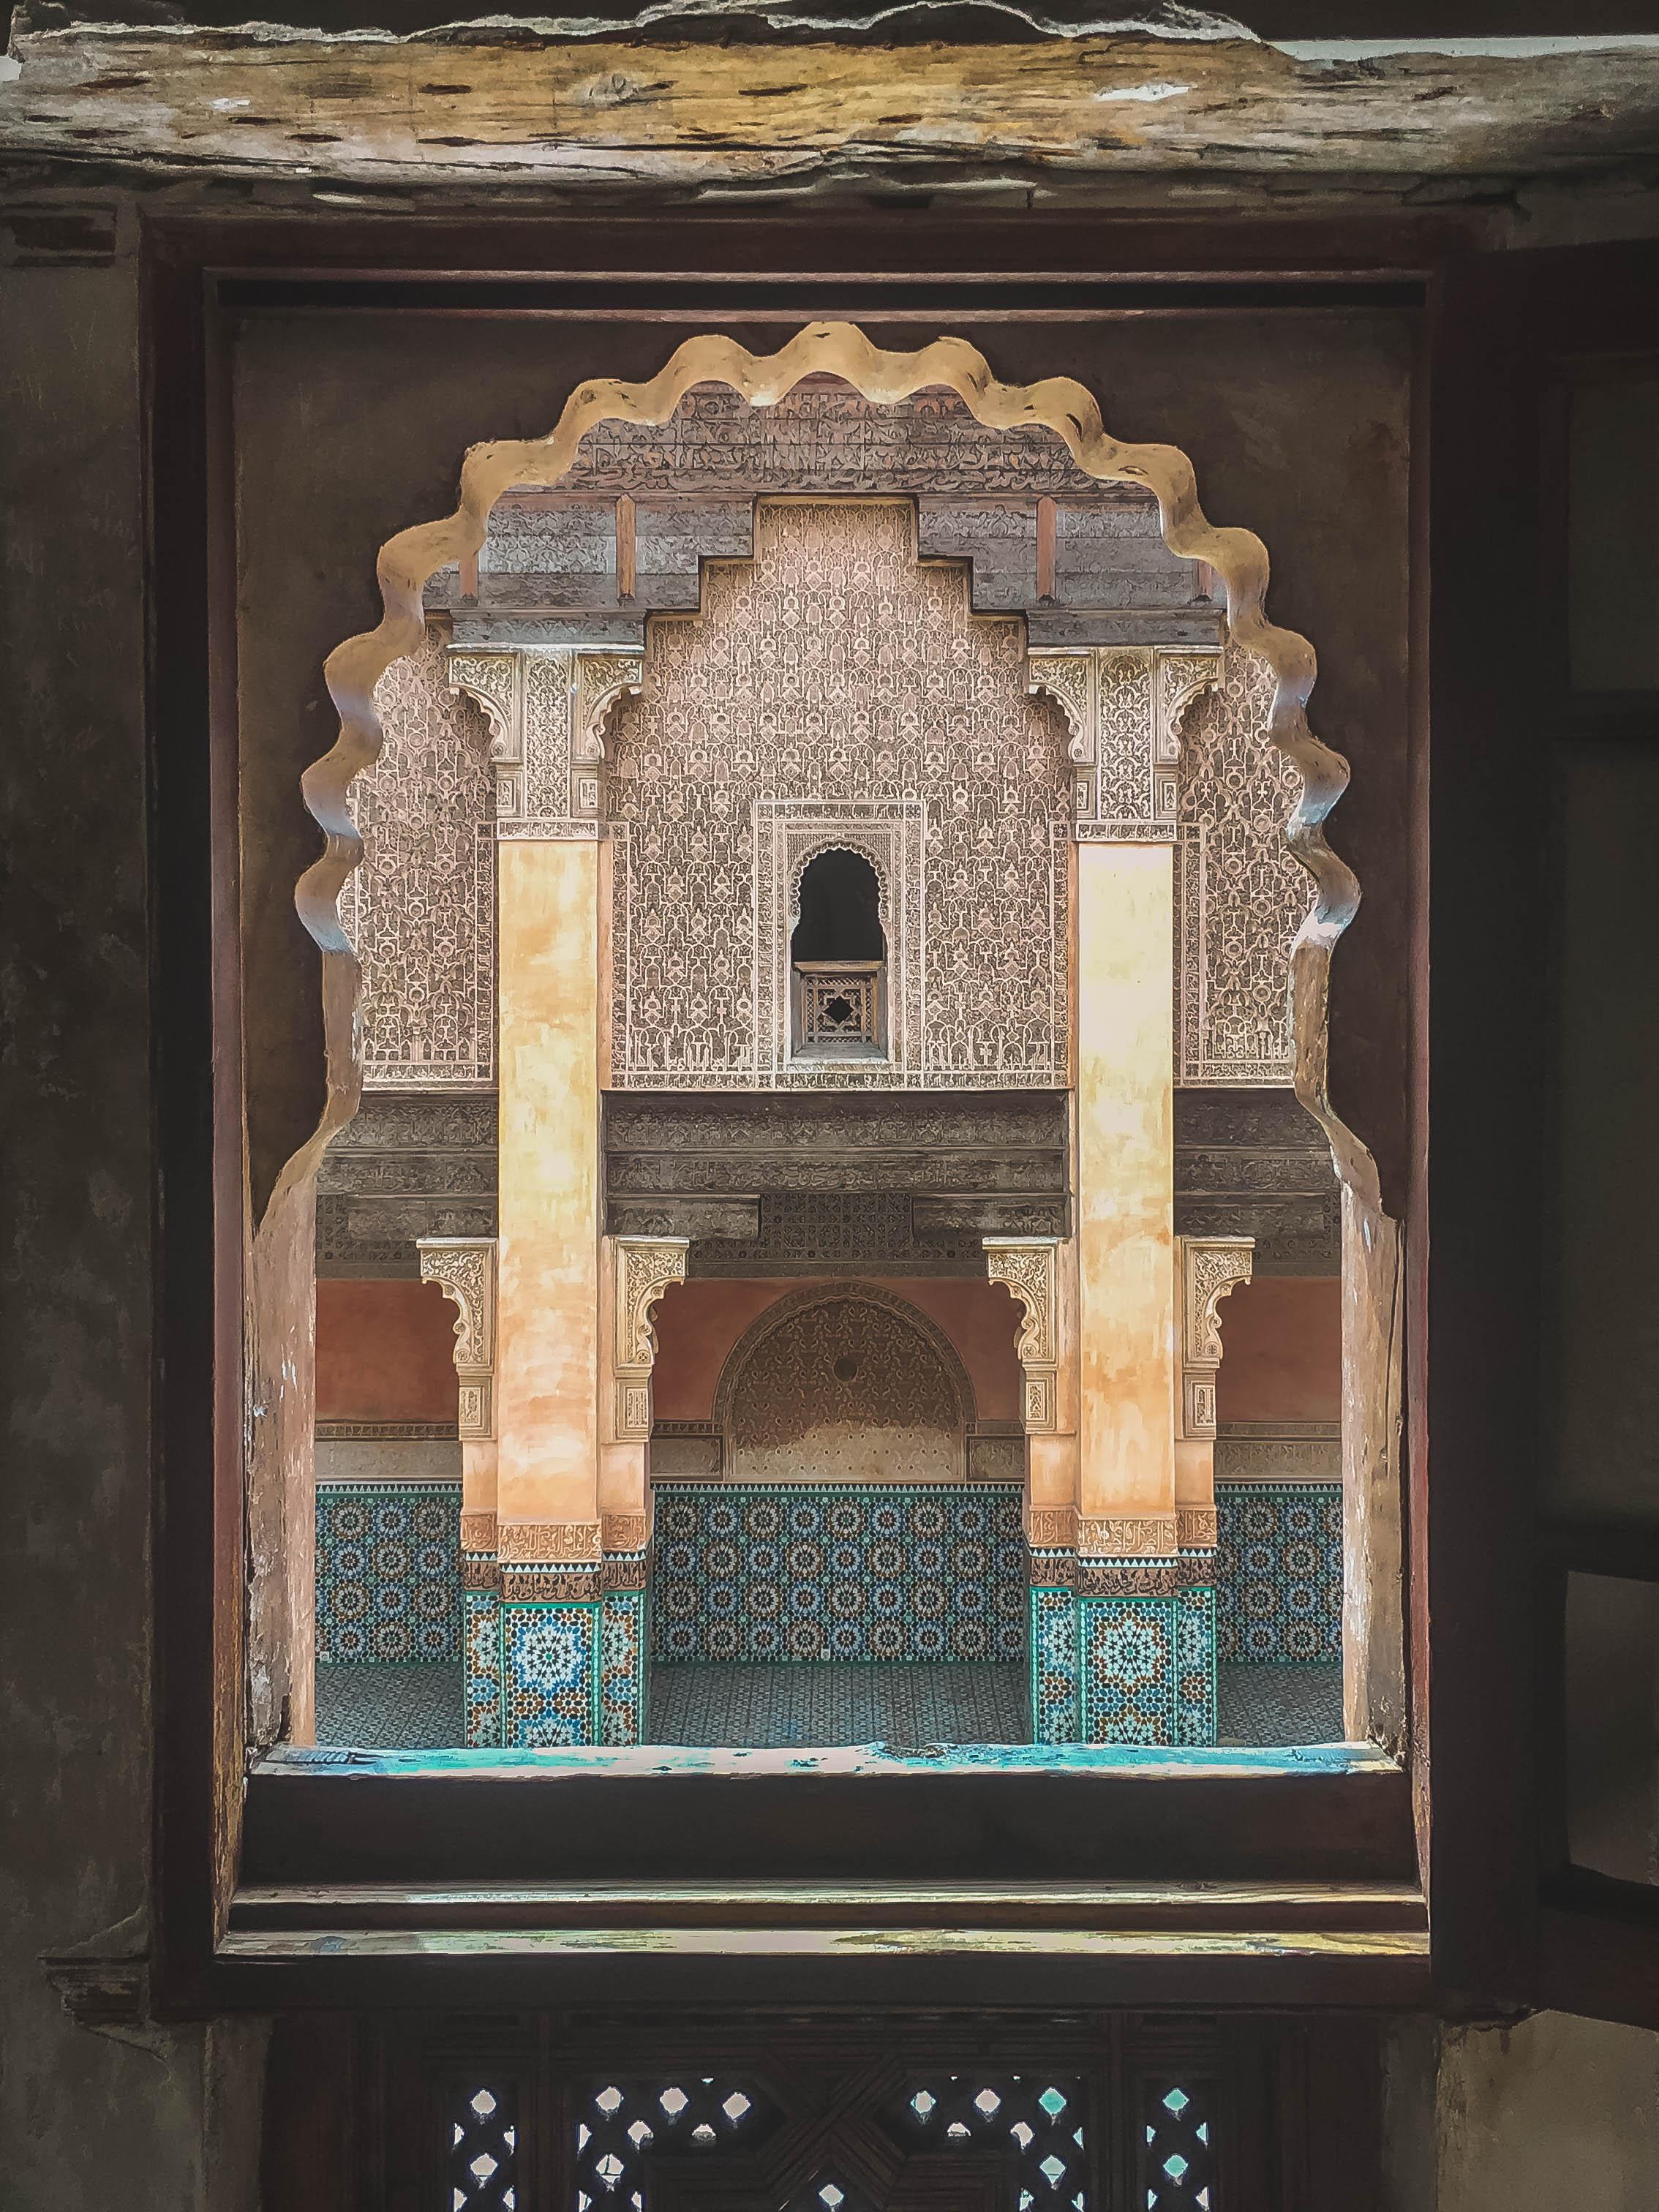 Madrasa Ben Youssef I, Marrakech